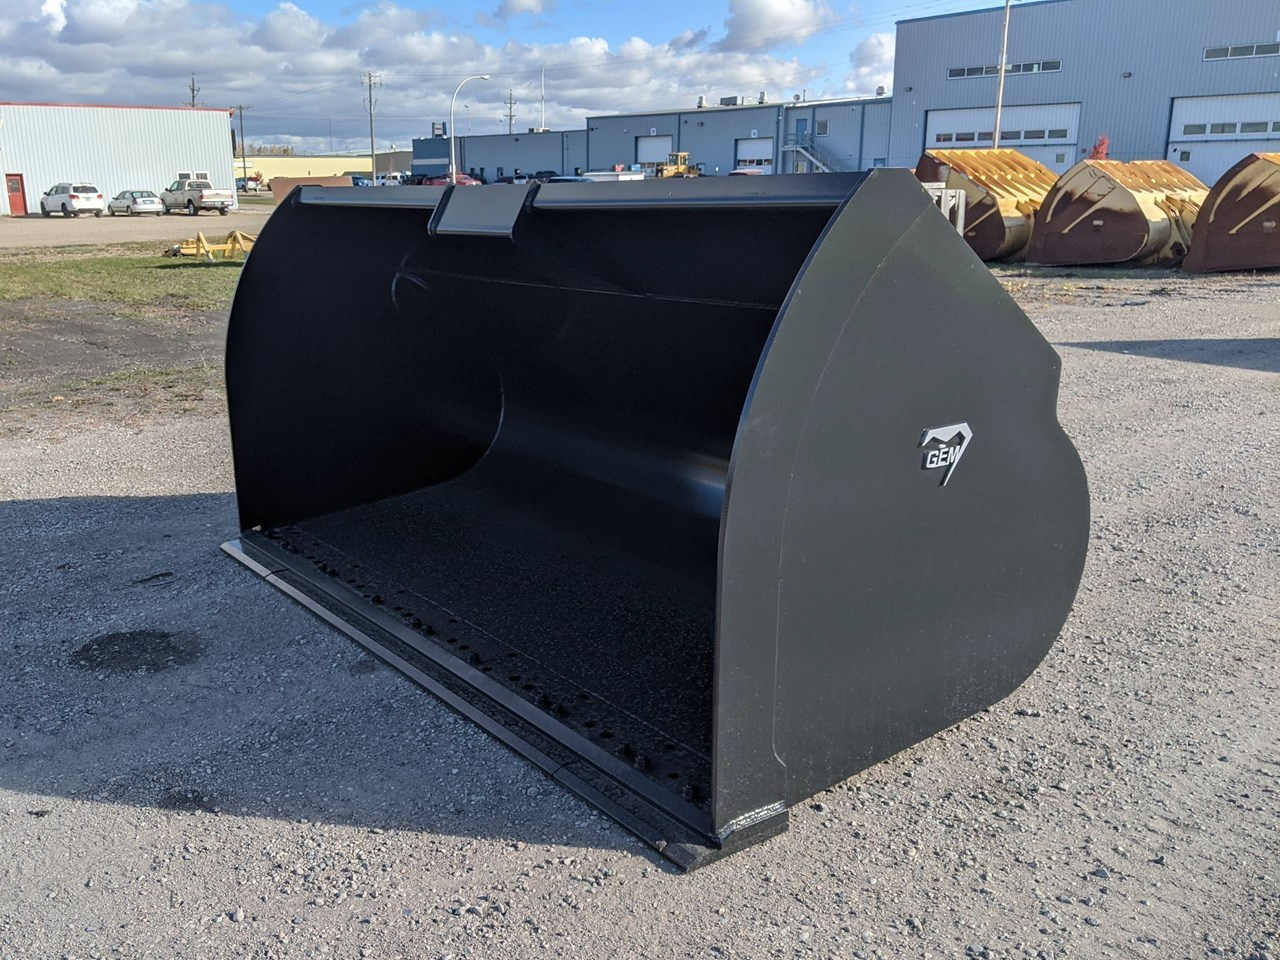 2020 GEM WA320B-SNOW Loader Bucket For Sale